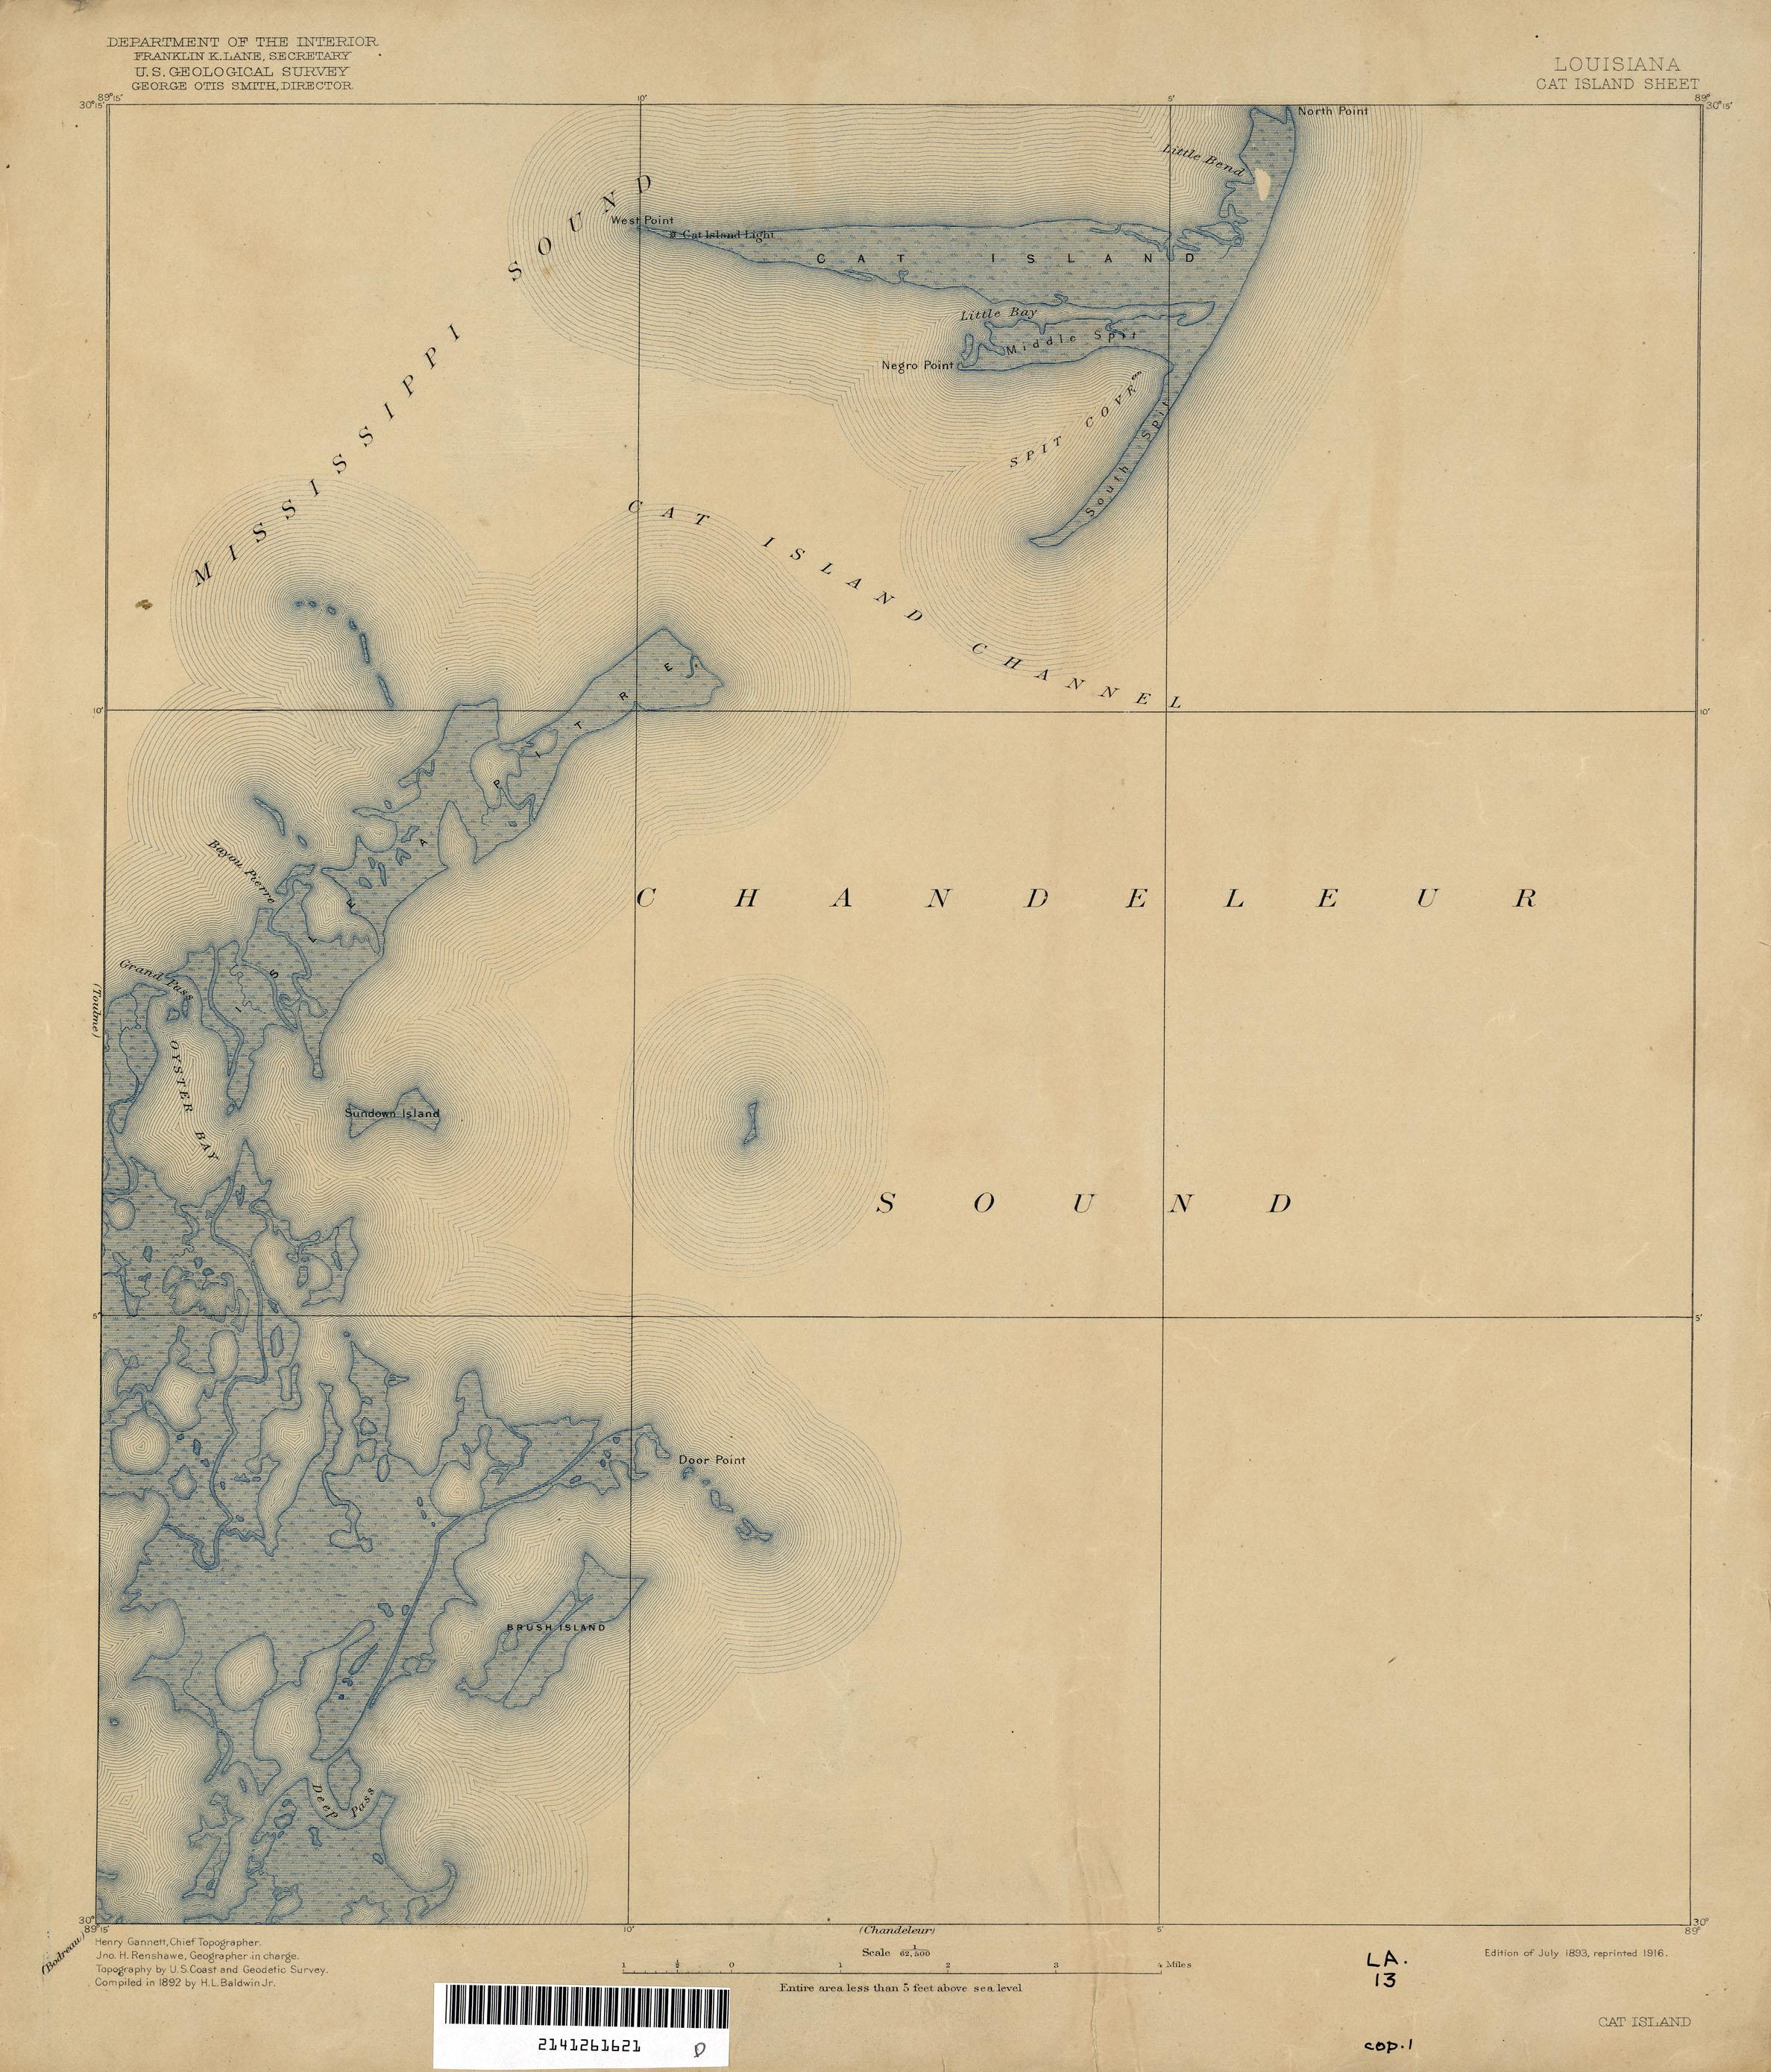 Louisiana Topographic Maps PerryCastaeda Map Collection UT